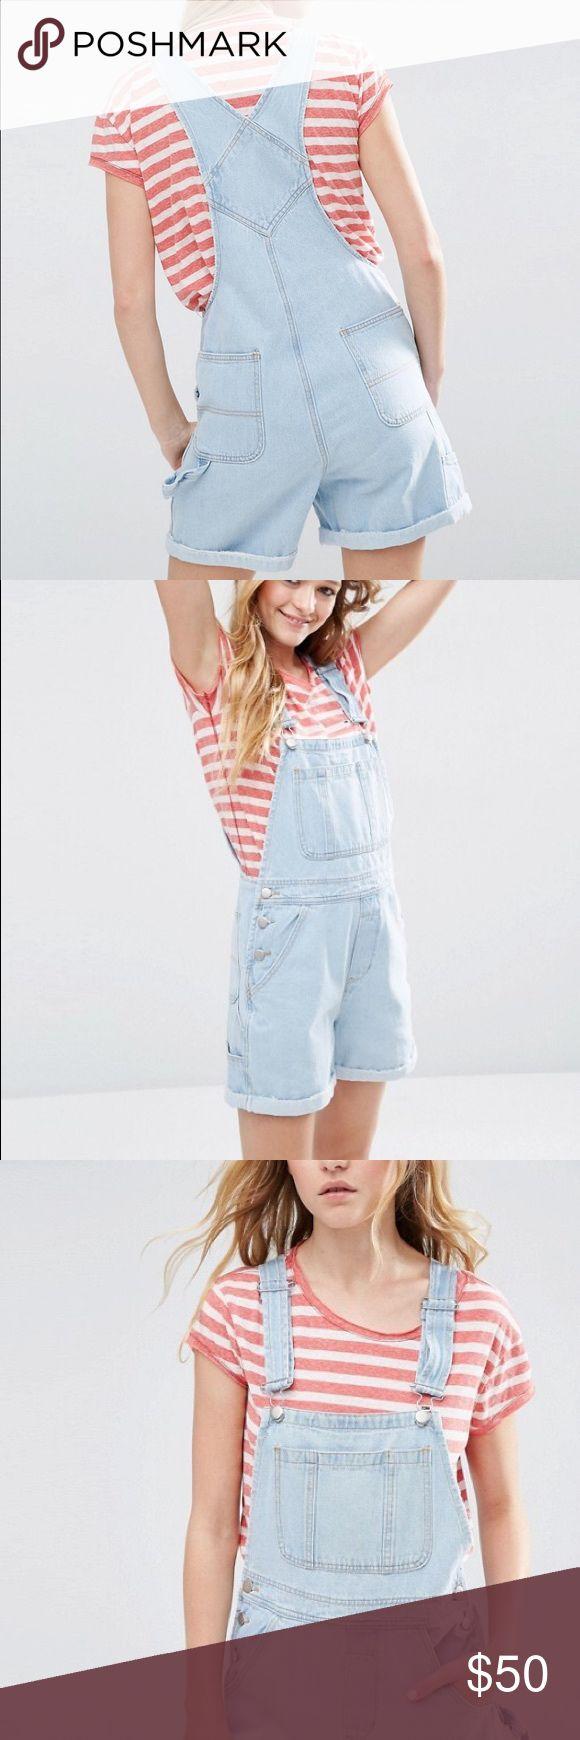 ASOS Denim Short Overall In Bleach Wash Worn once brand new ASOS Dresses